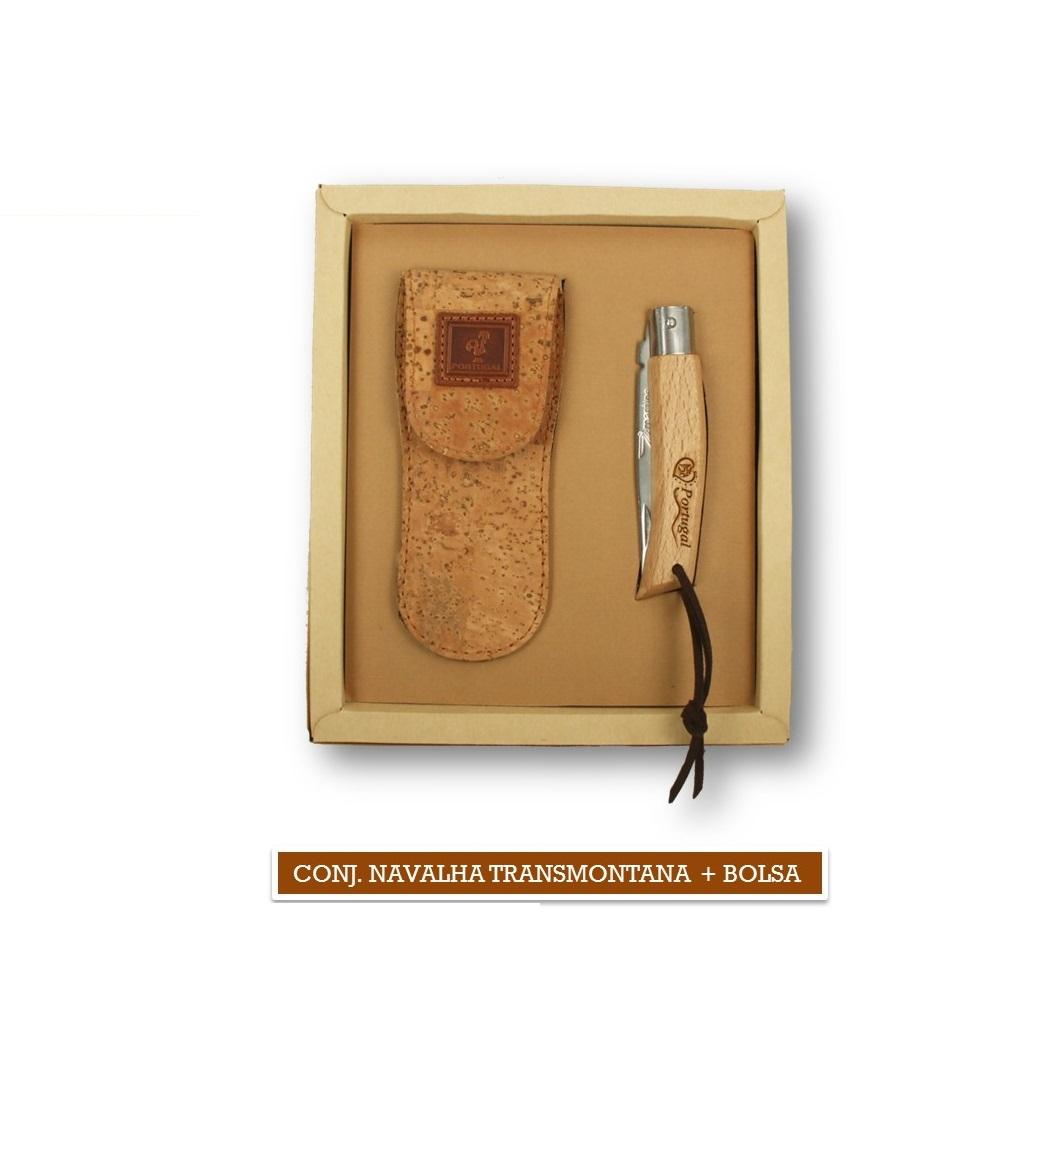 Conjunto Navalha Transmontana + Bolsa